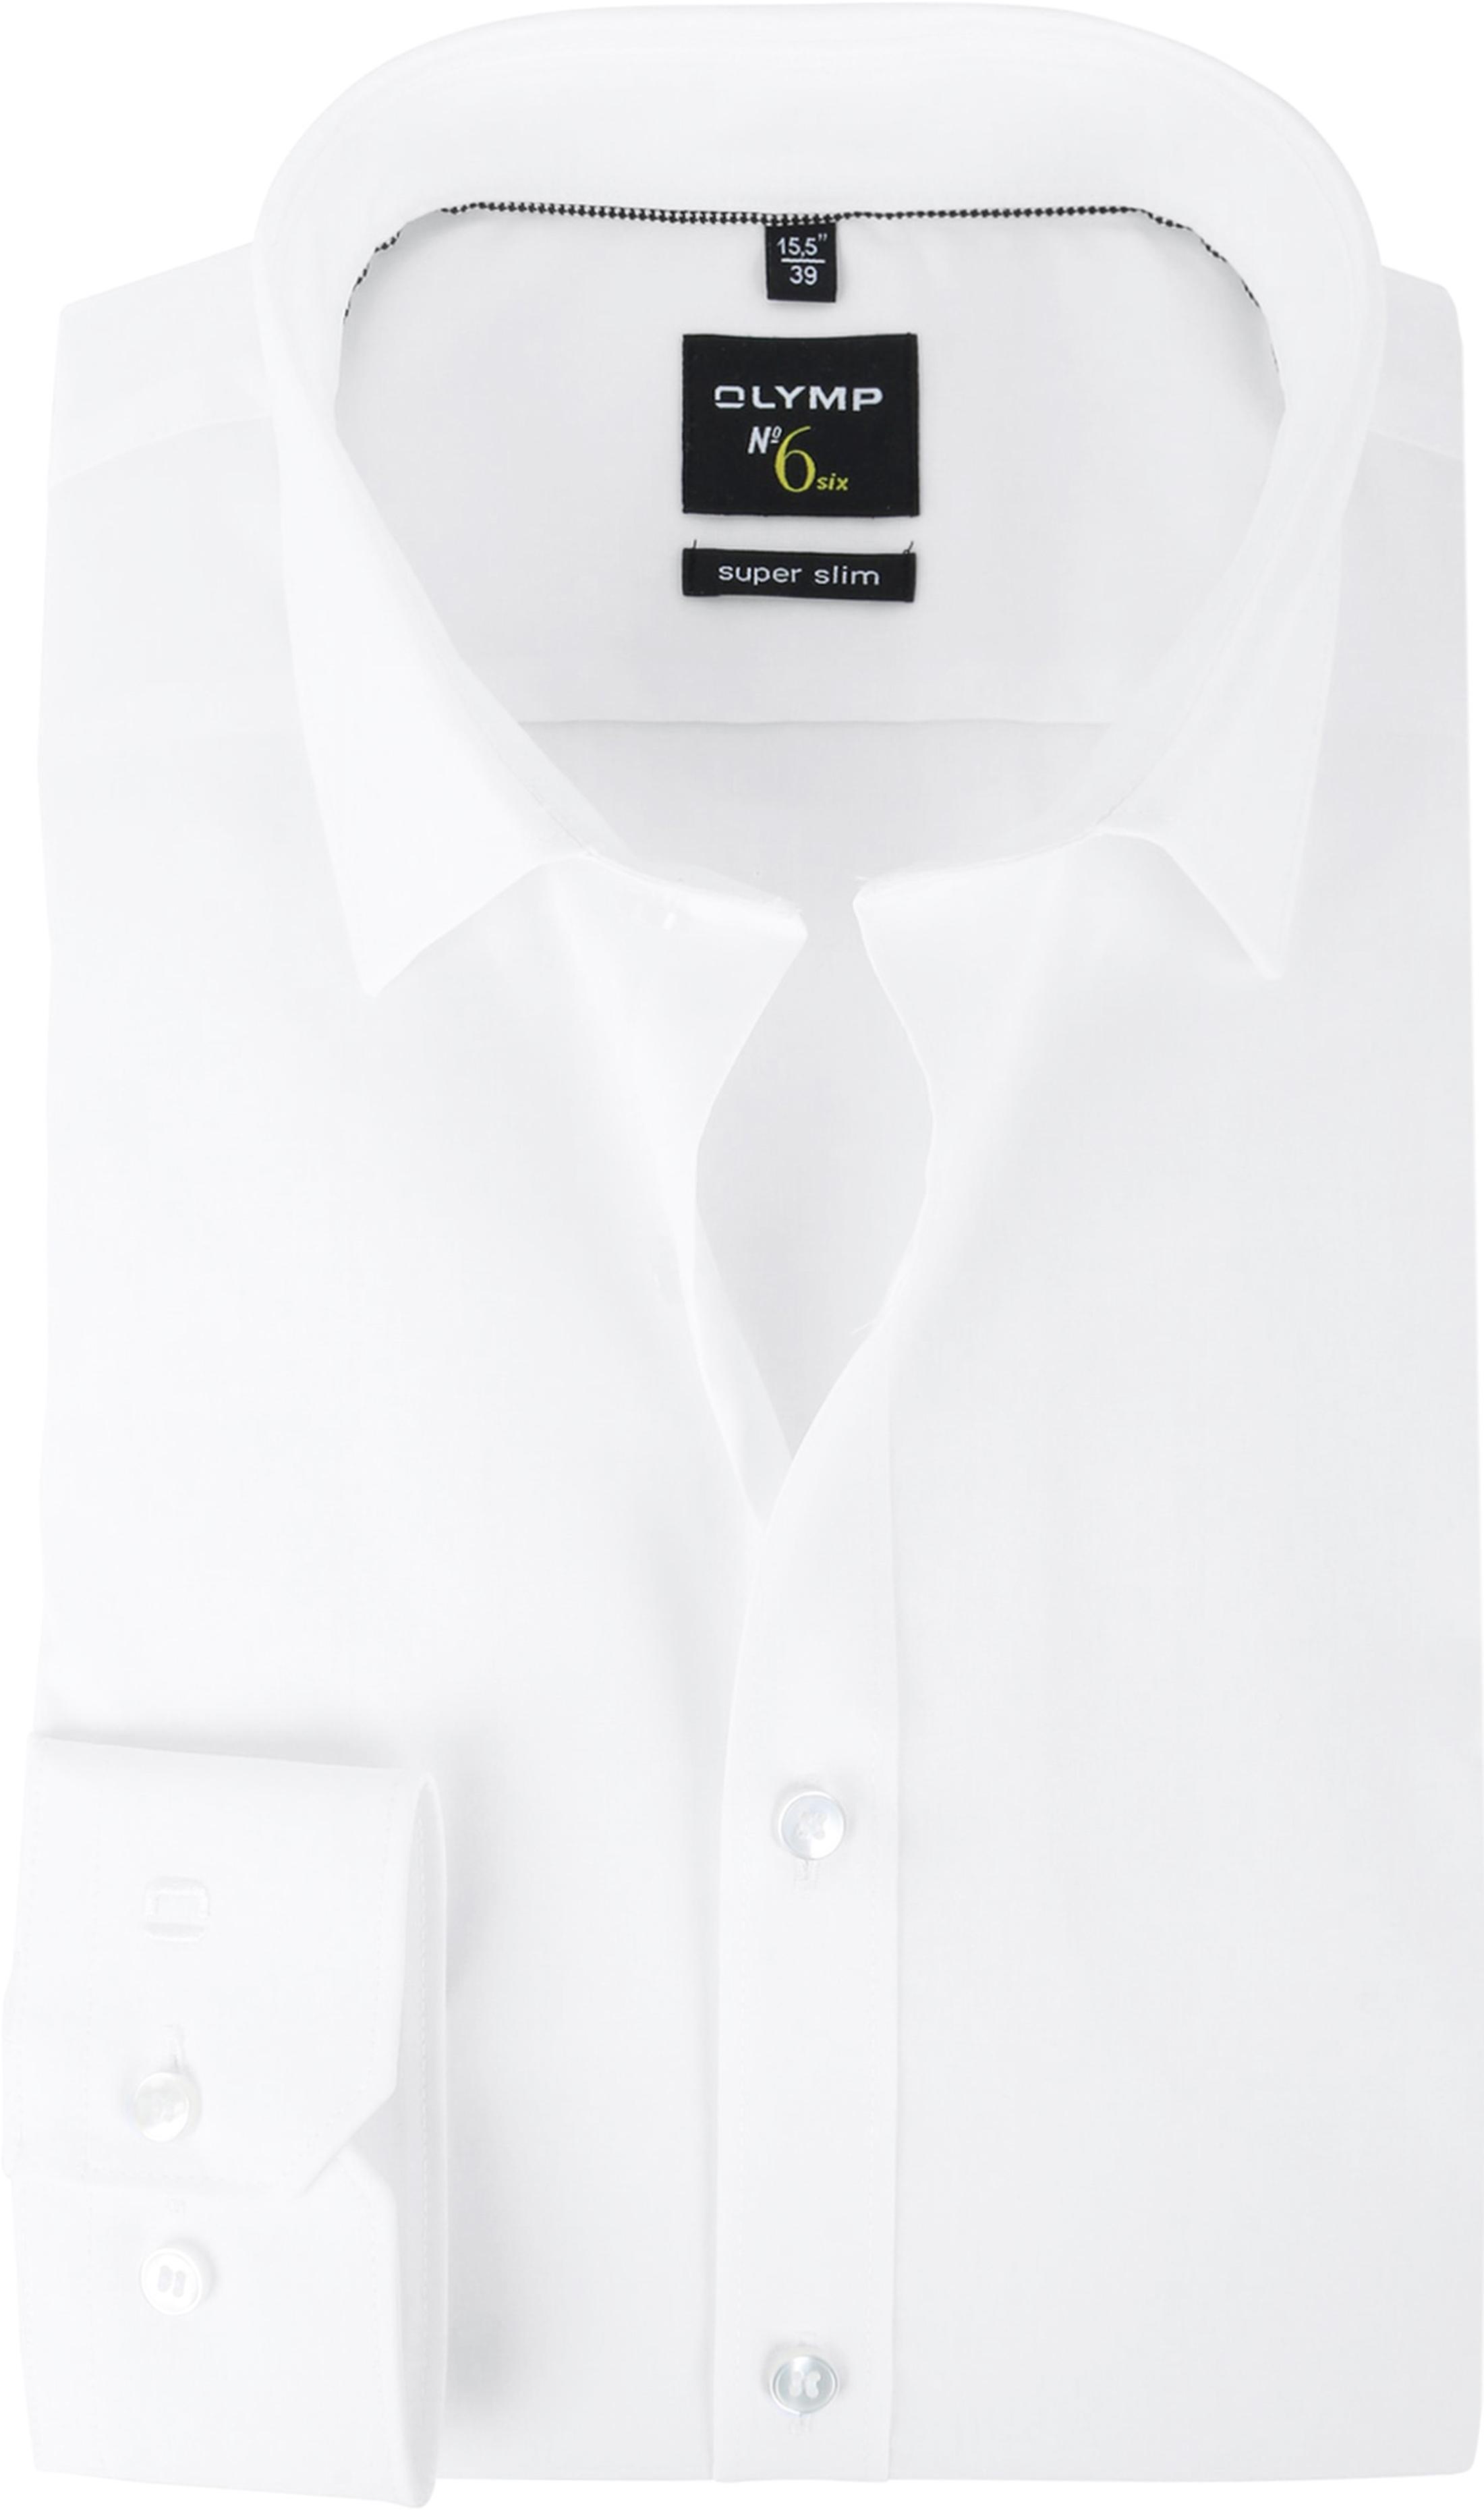 Overhemd Wit Slim Fit.Olymp No 6 Six Skinny Fit Overhemd Wit 046664 Online Bestellen